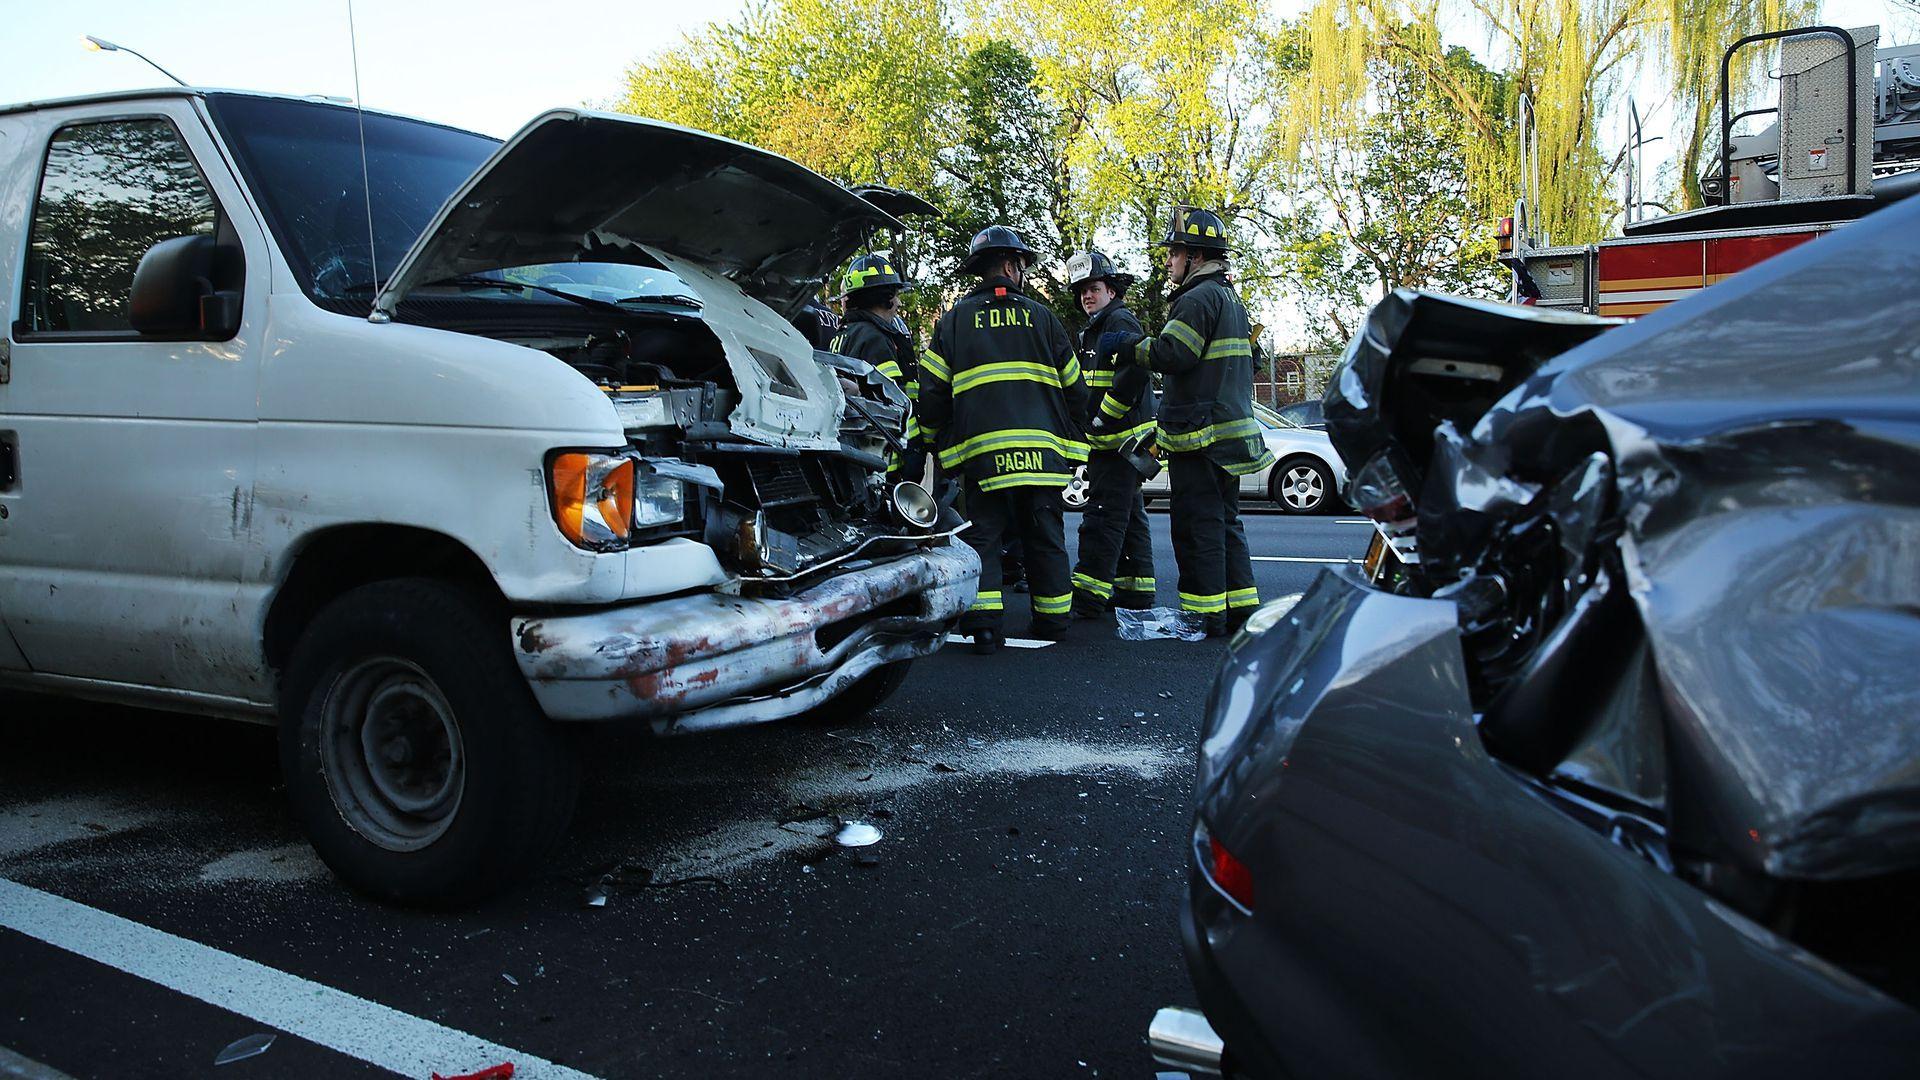 Cars damaged post-collision.